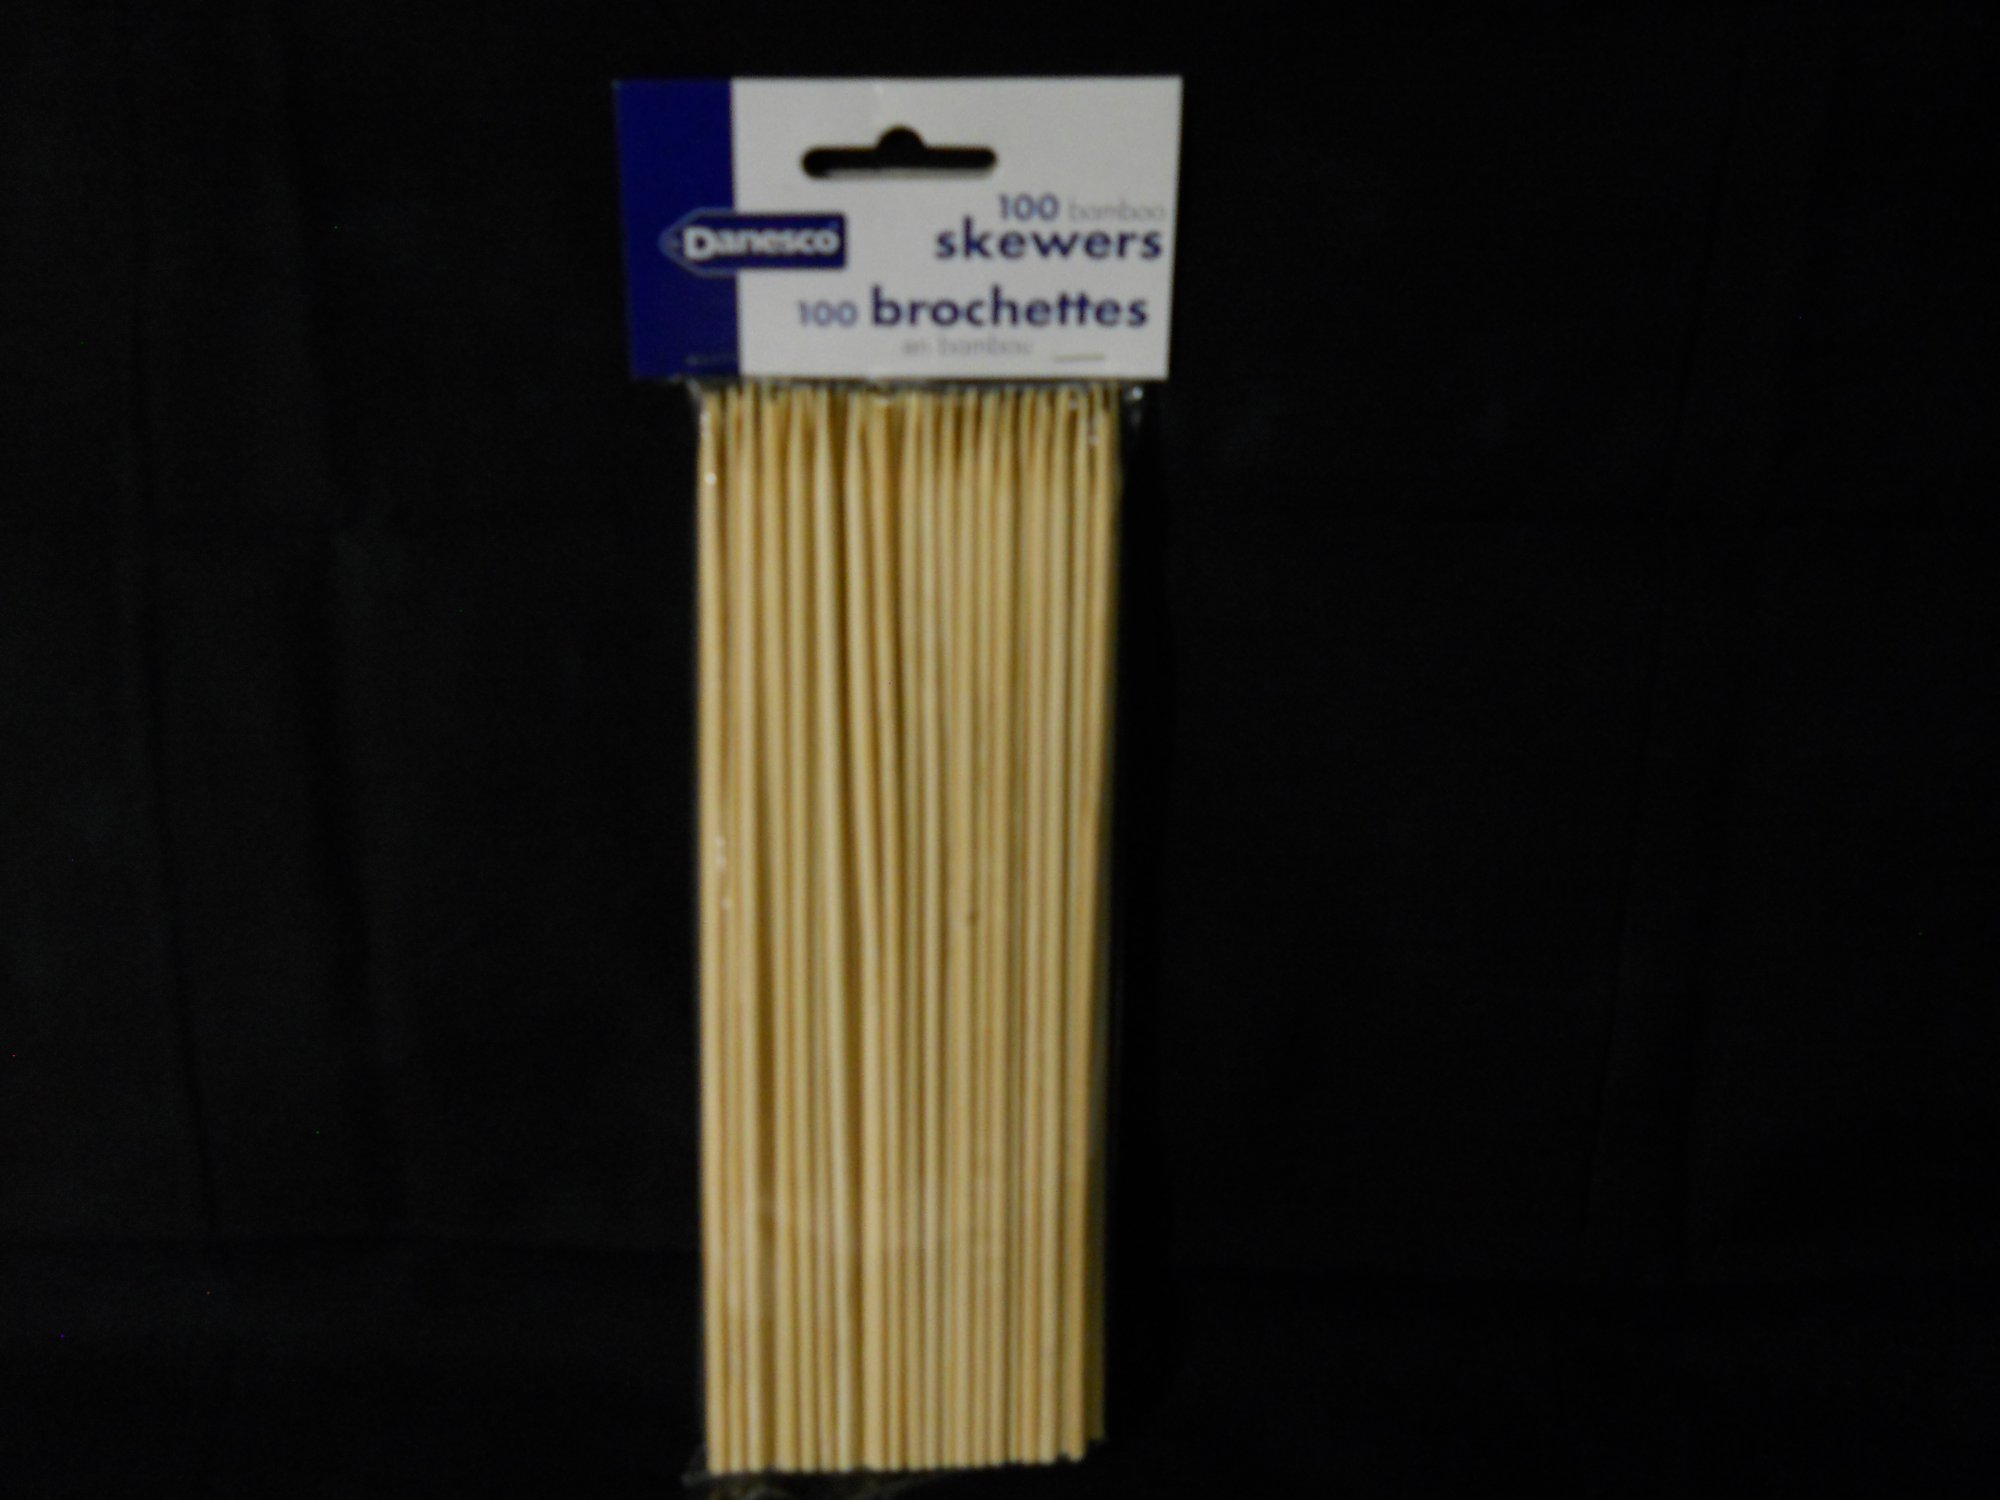 Danesco bamboo skewers 8